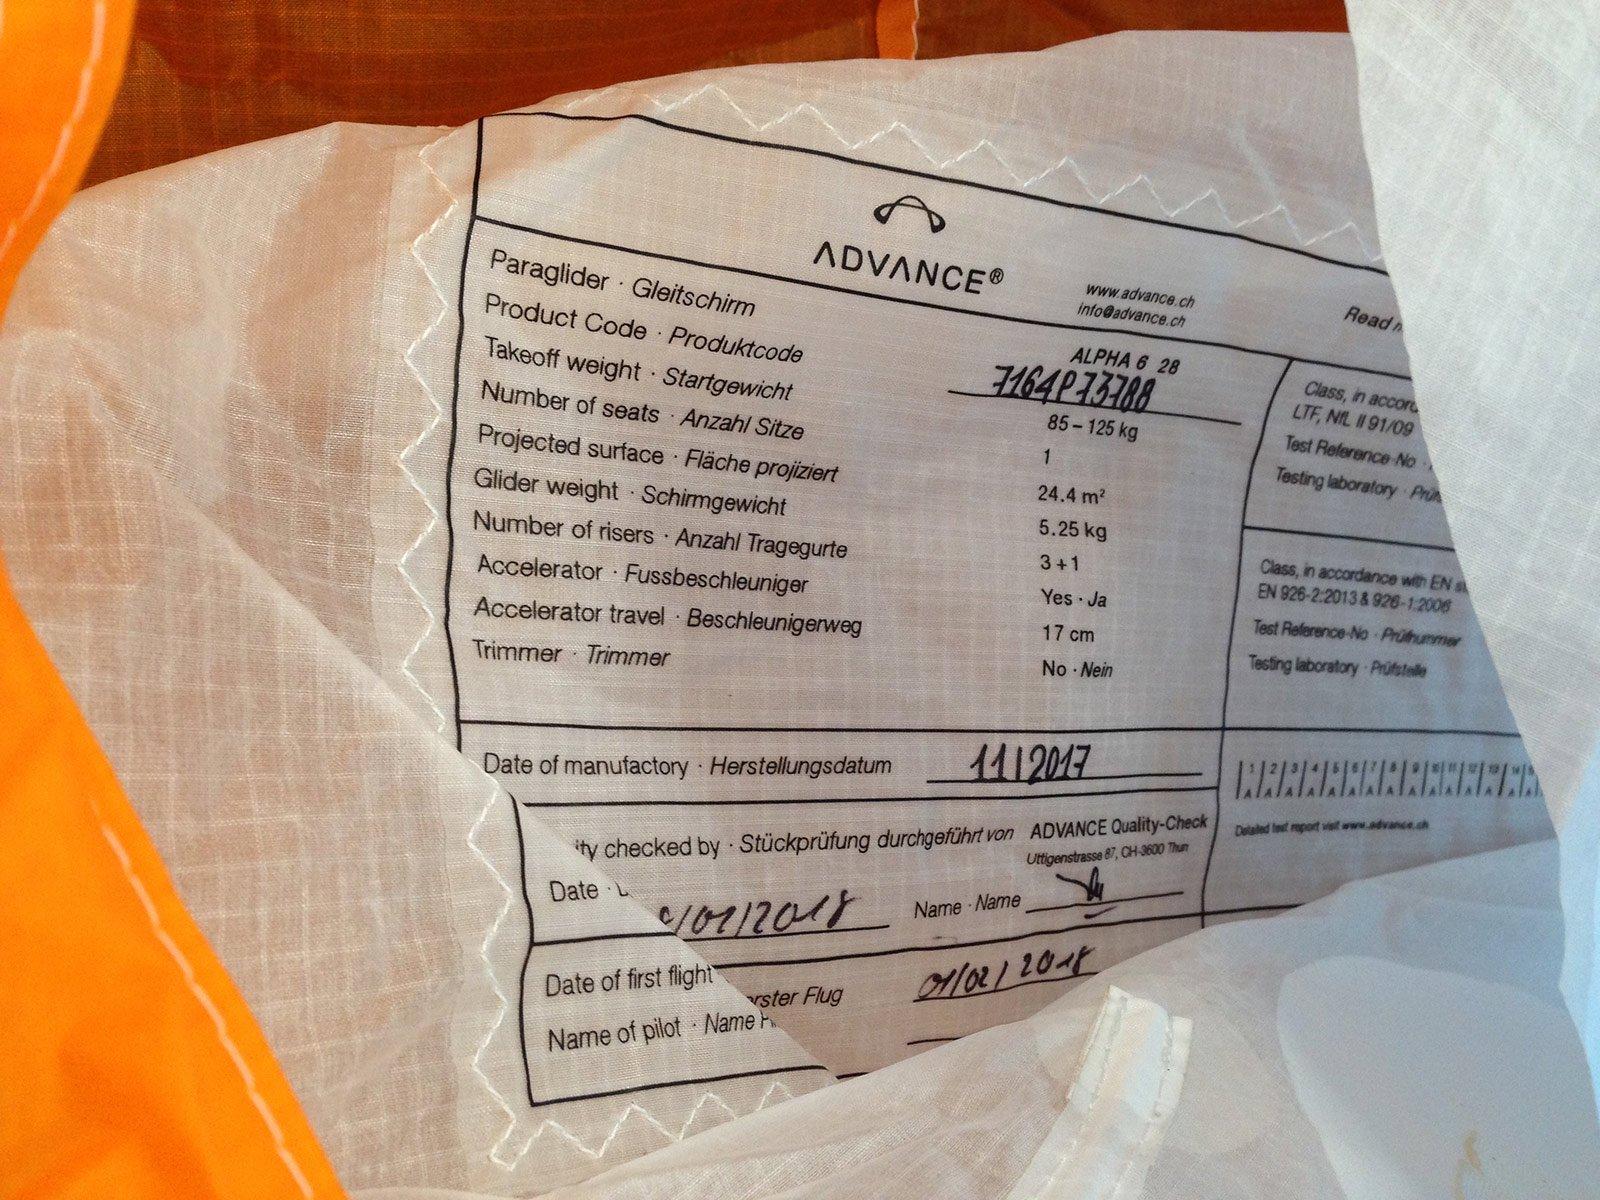 Check Alpha 6 Typenblatt Identifizierung des Fluggerätes